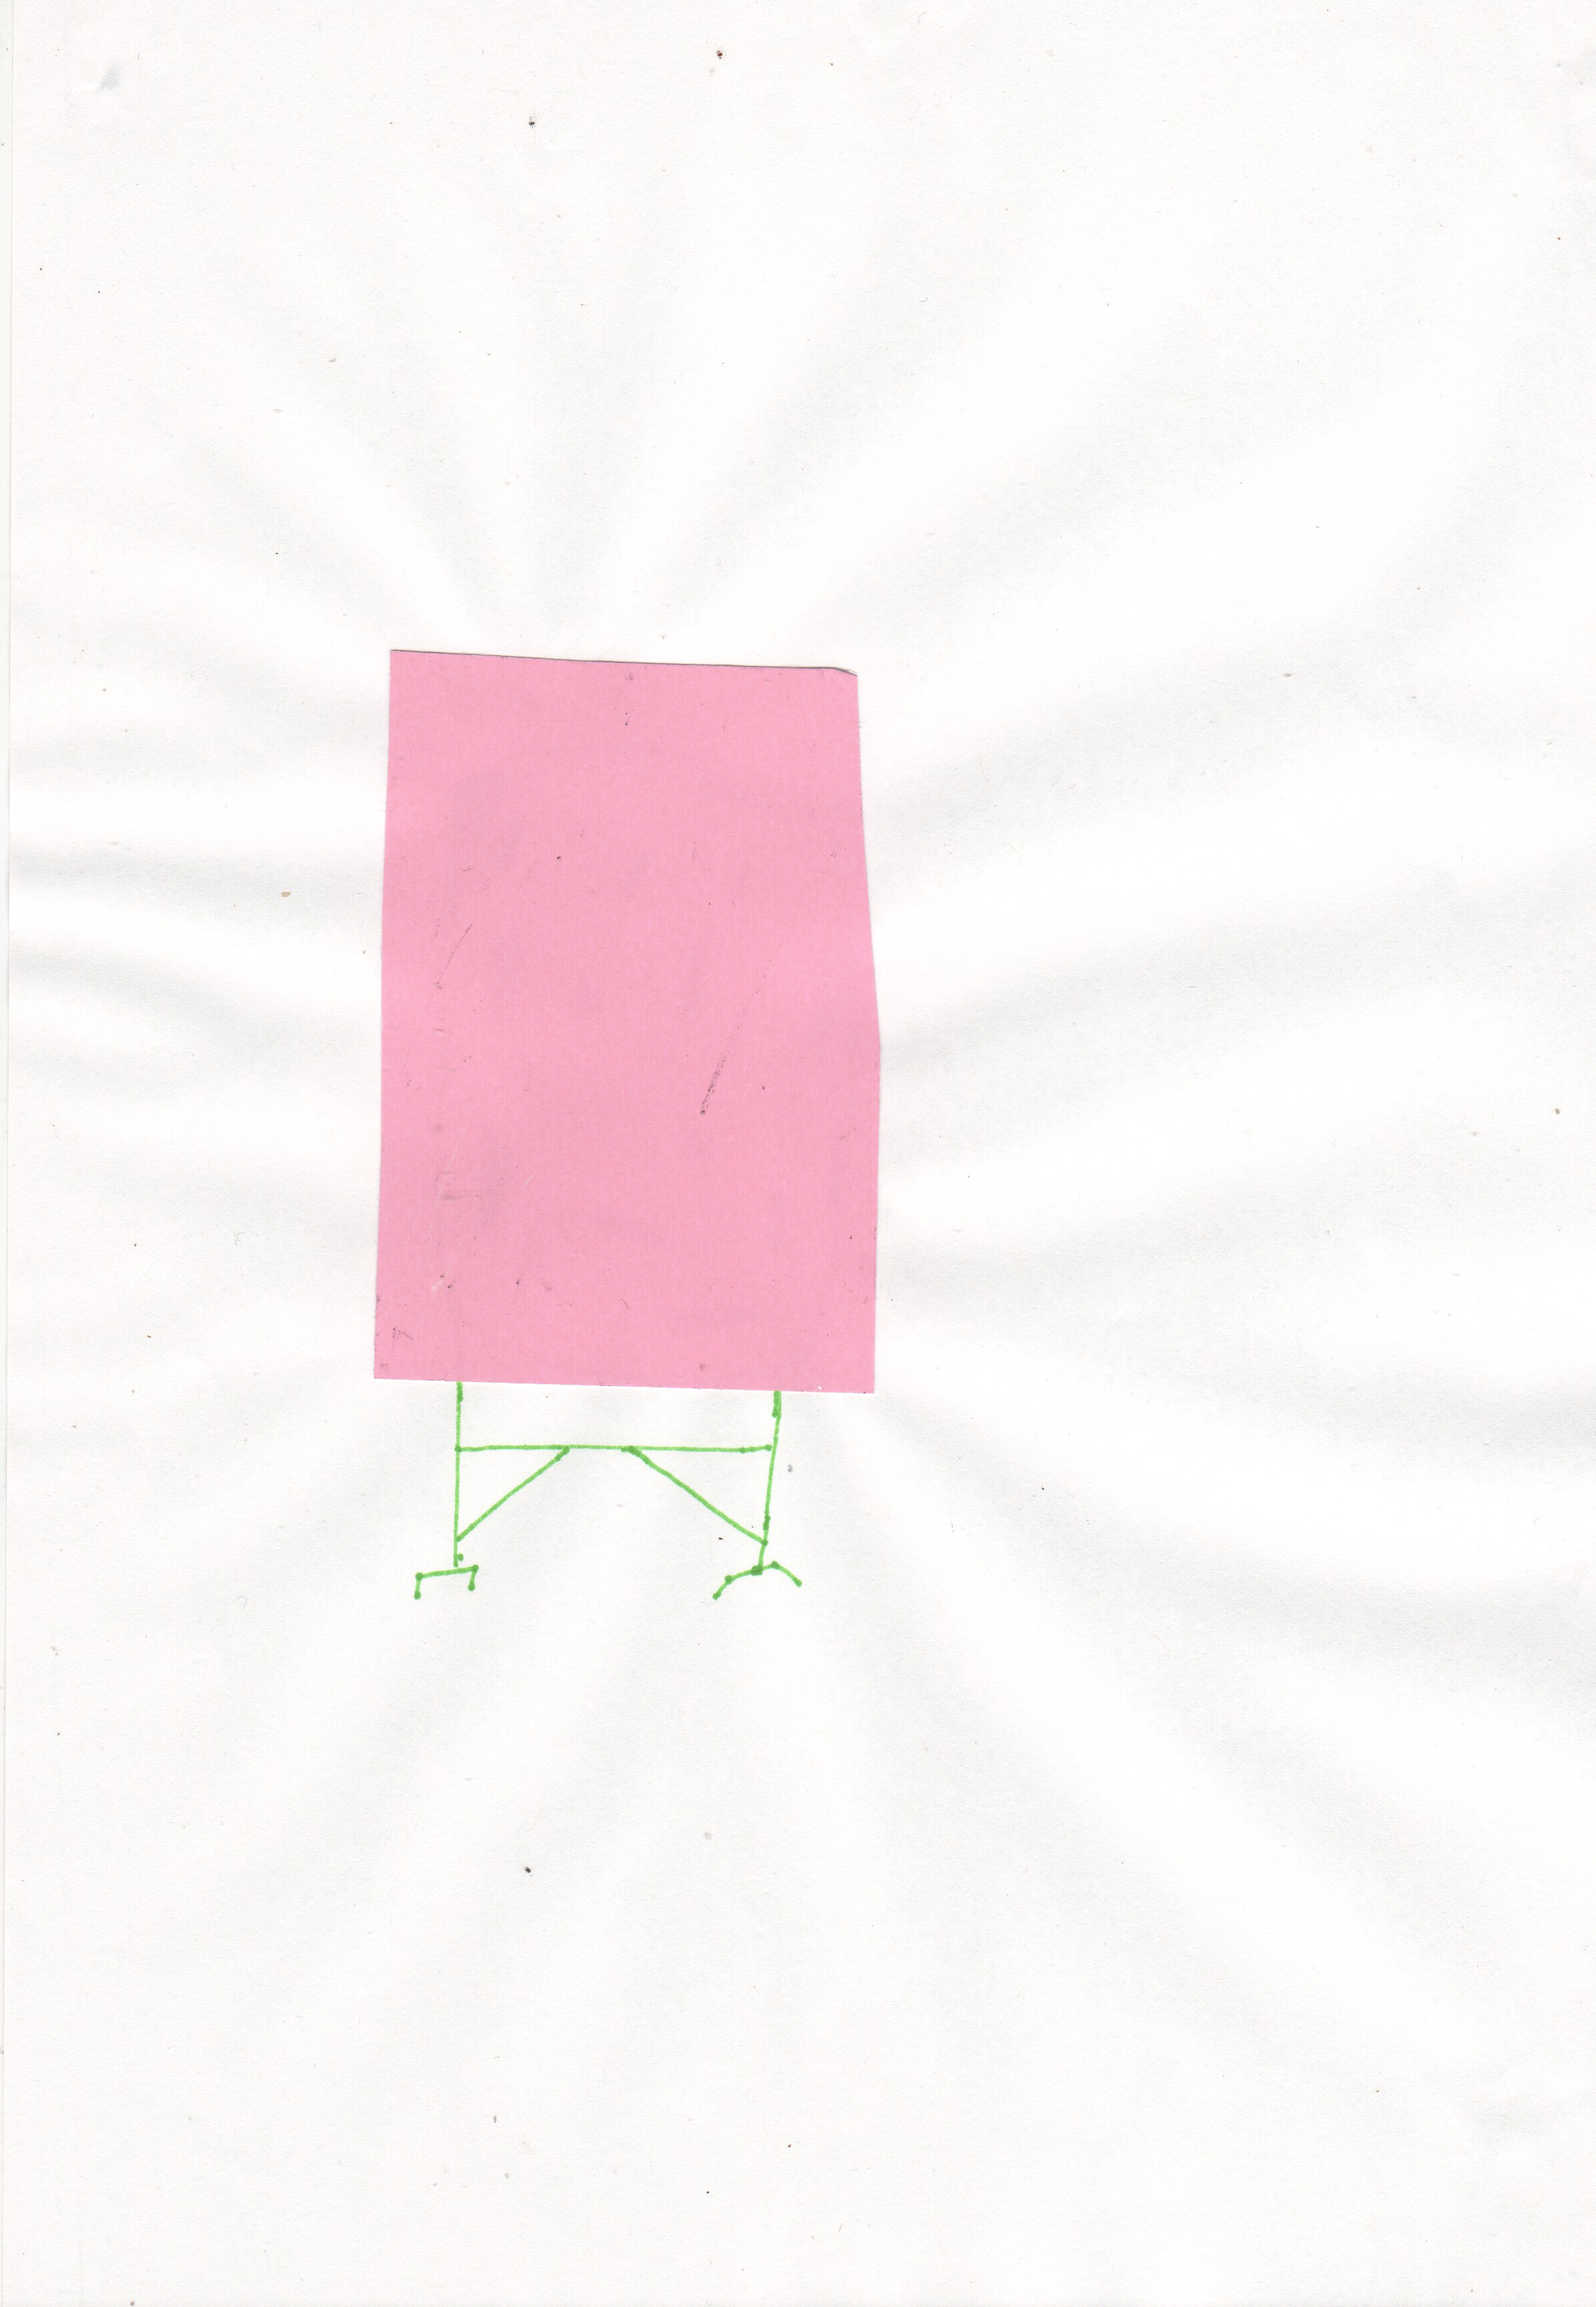 Pink board